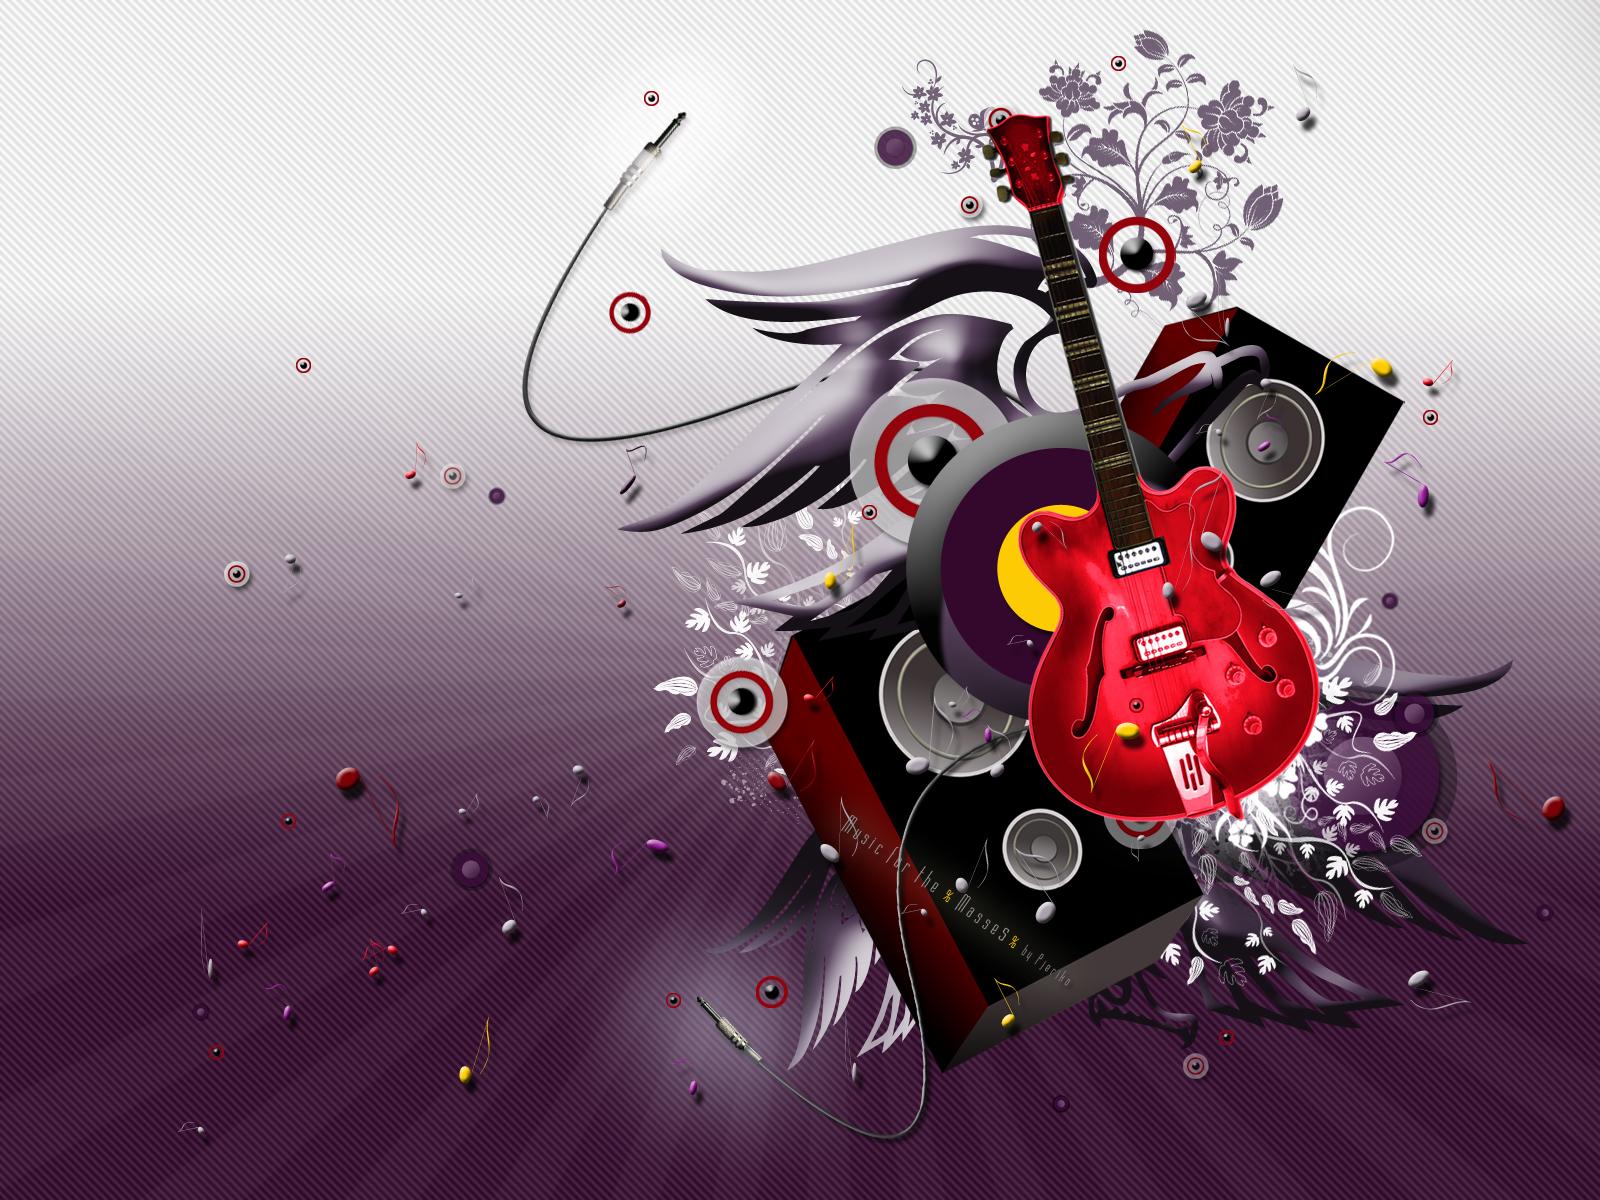 http://1.bp.blogspot.com/-7TUwTLlfAqY/Tzd79xMoxWI/AAAAAAAACbY/rae-p835SCc/s1600/I+love+Music--6.jpg